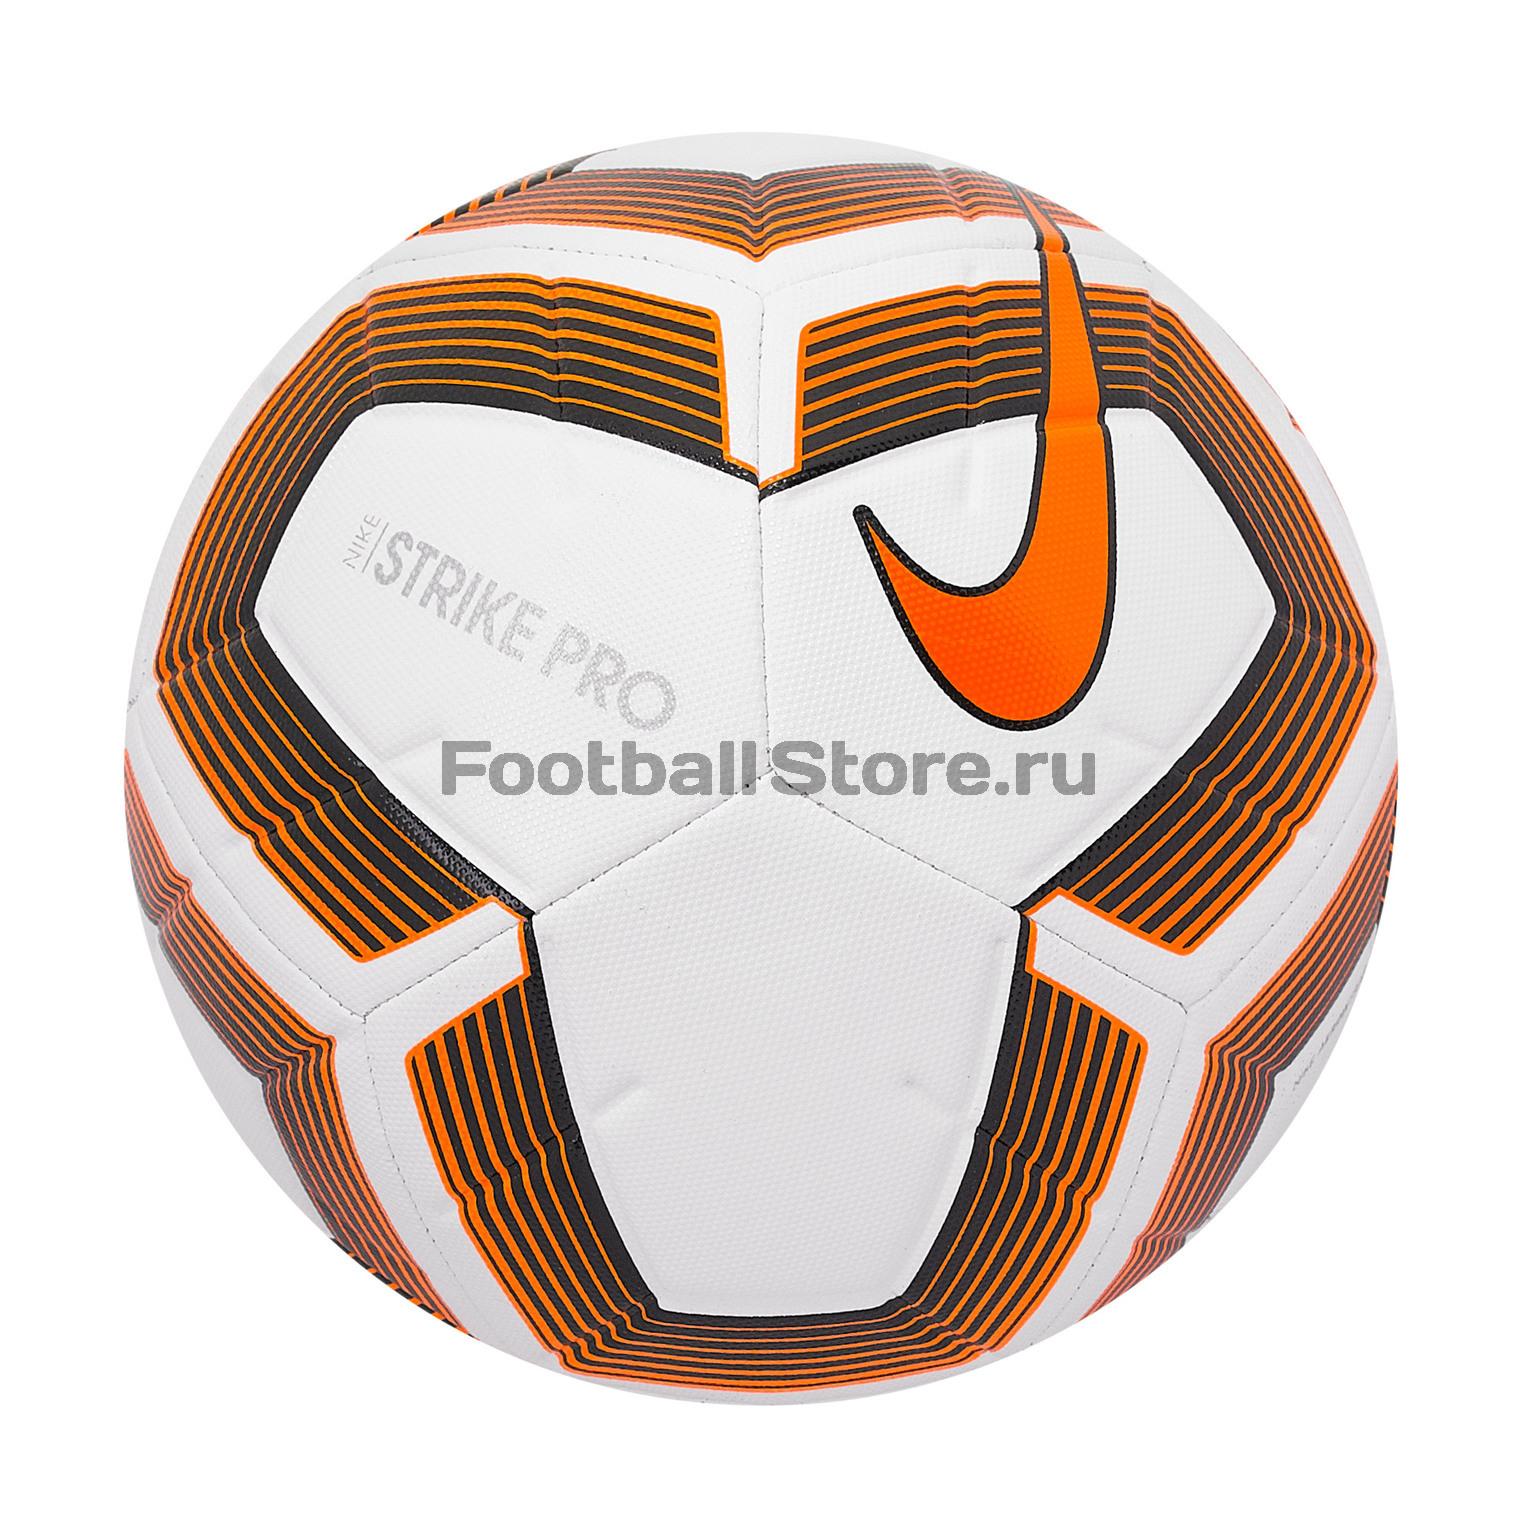 Футбольный мяч Nike Strike Pro TM SC3936-101 футбольный мяч nike strike pro team fifa sc3539 101